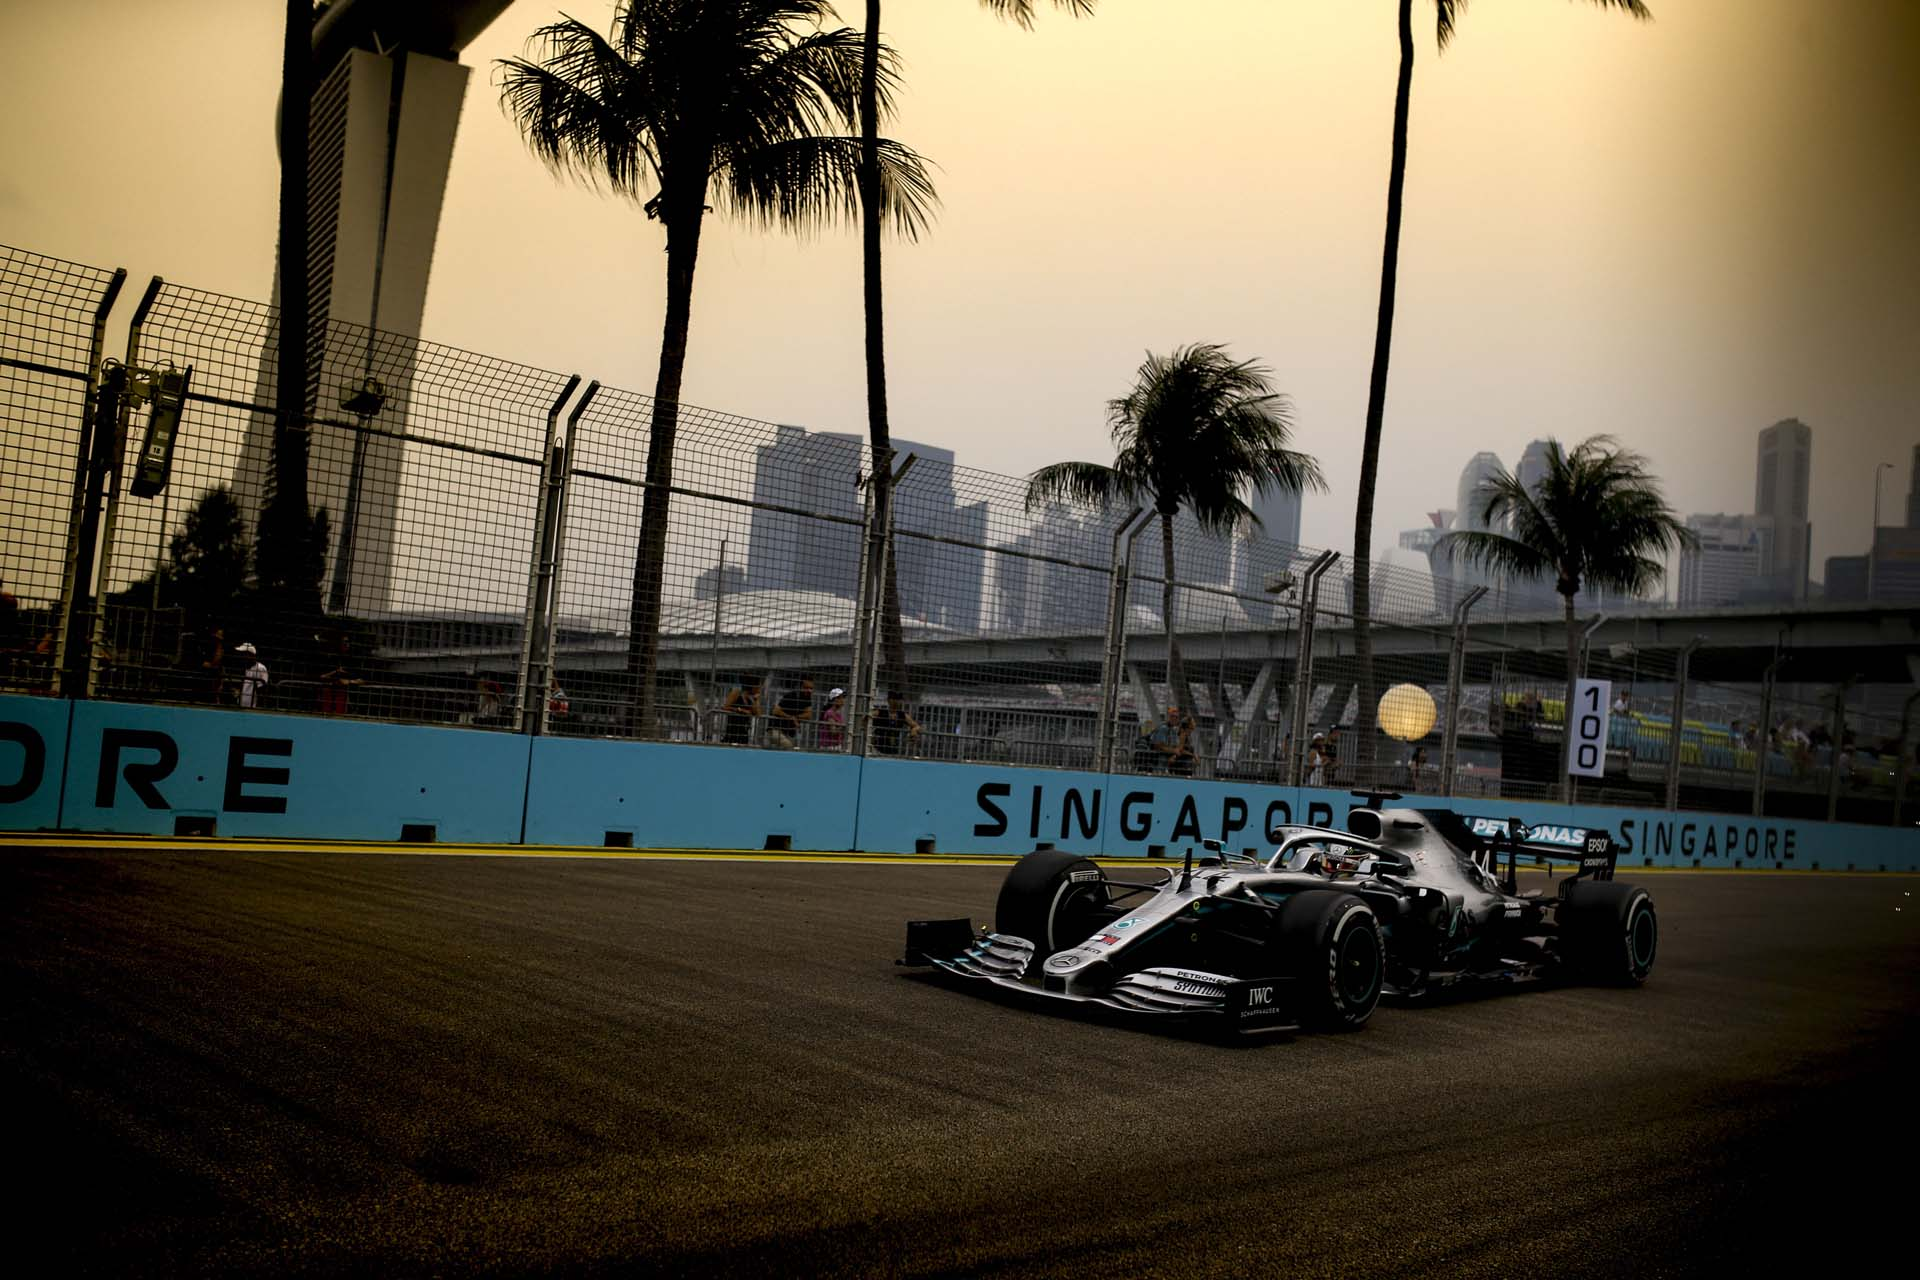 2019 Singapore Grand Prix, Friday - Wolfgang Wilhelm